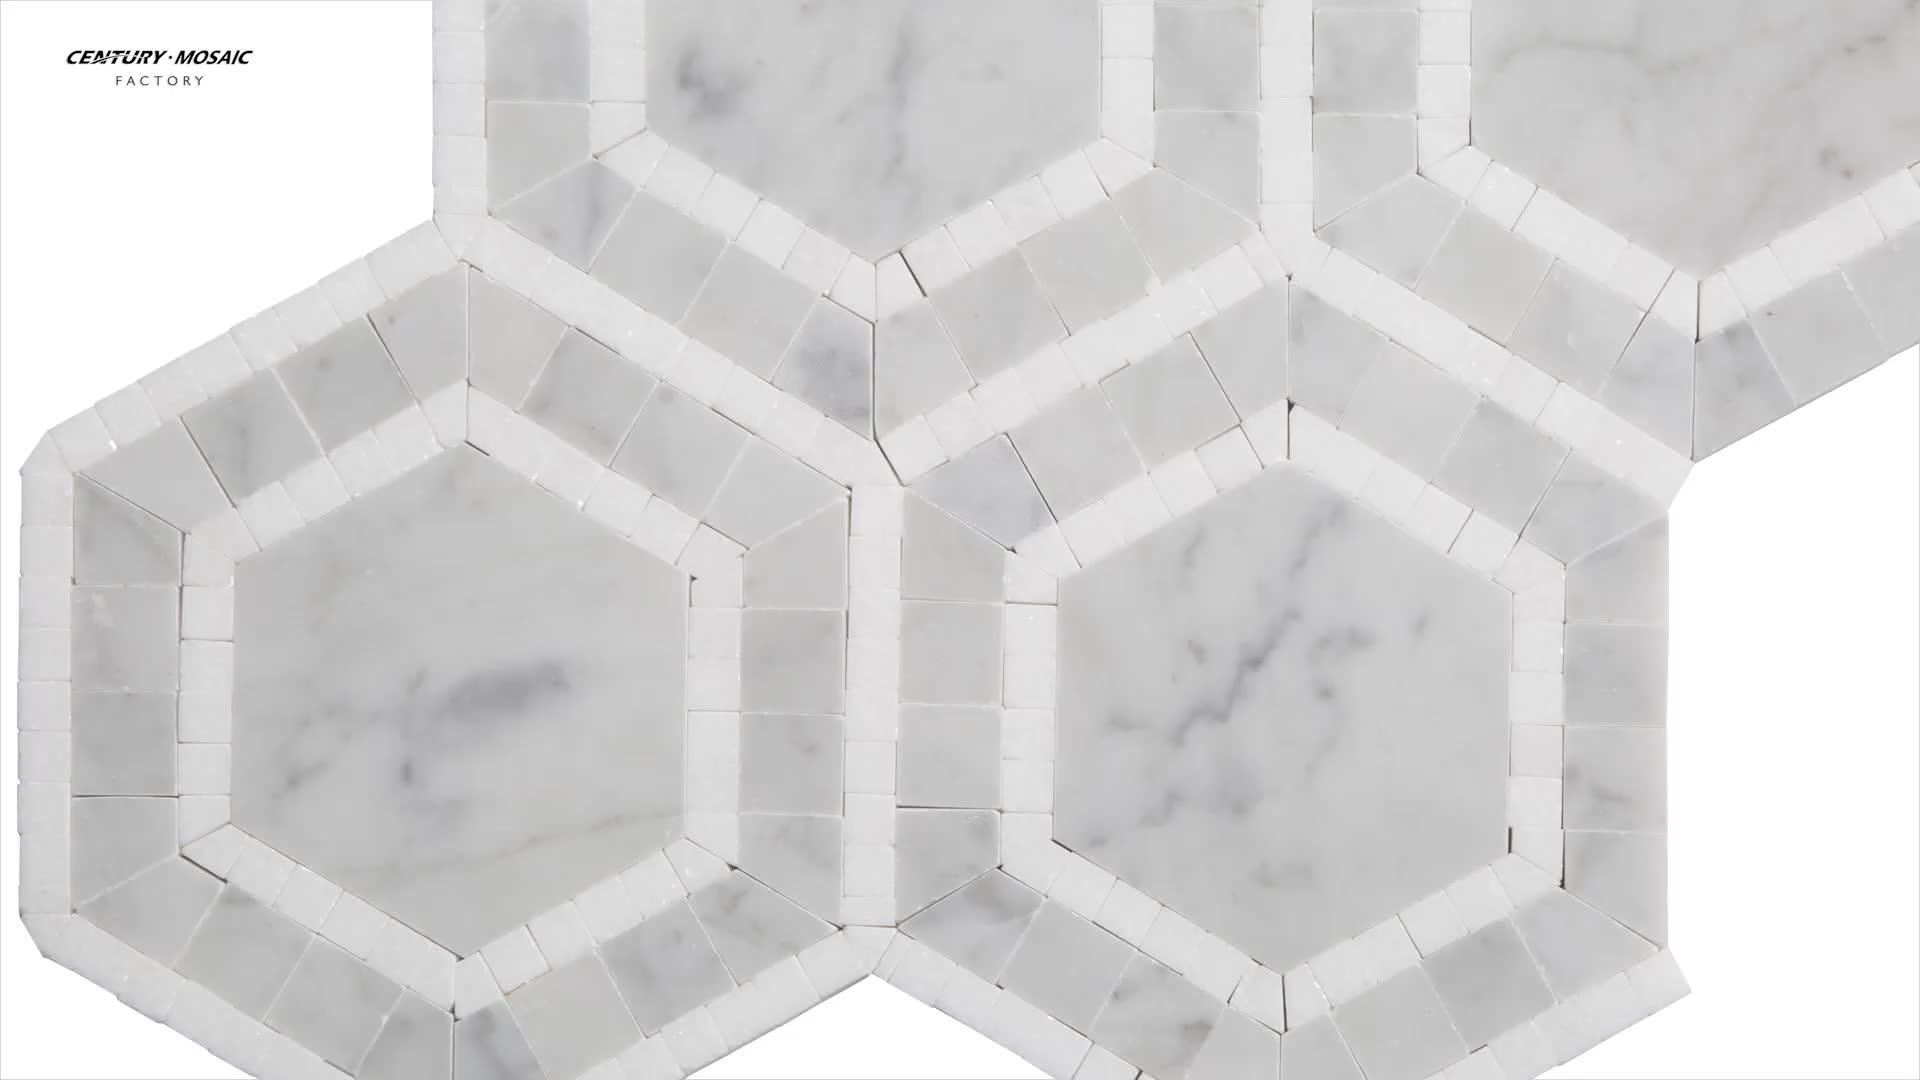 Carrara And White Thos Marble Hexagon Mosaic Bathroom Floor Tile Tiles Product